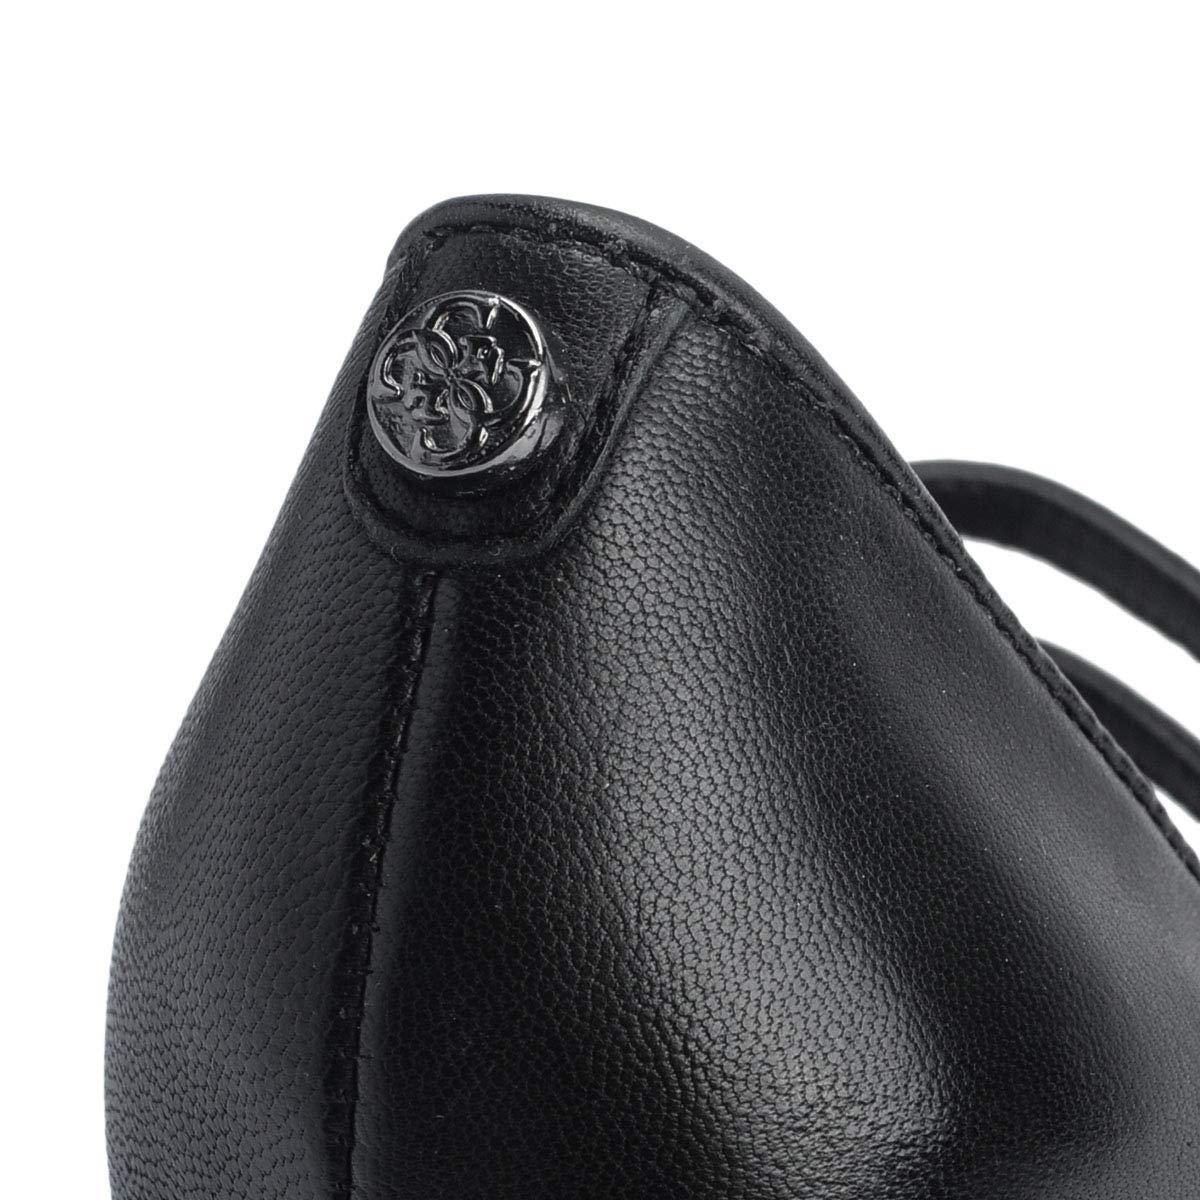 Guess , Damen Damen , Outdoor Fitnessschuhe schwarz schwarz 41 Schwarz 437c17